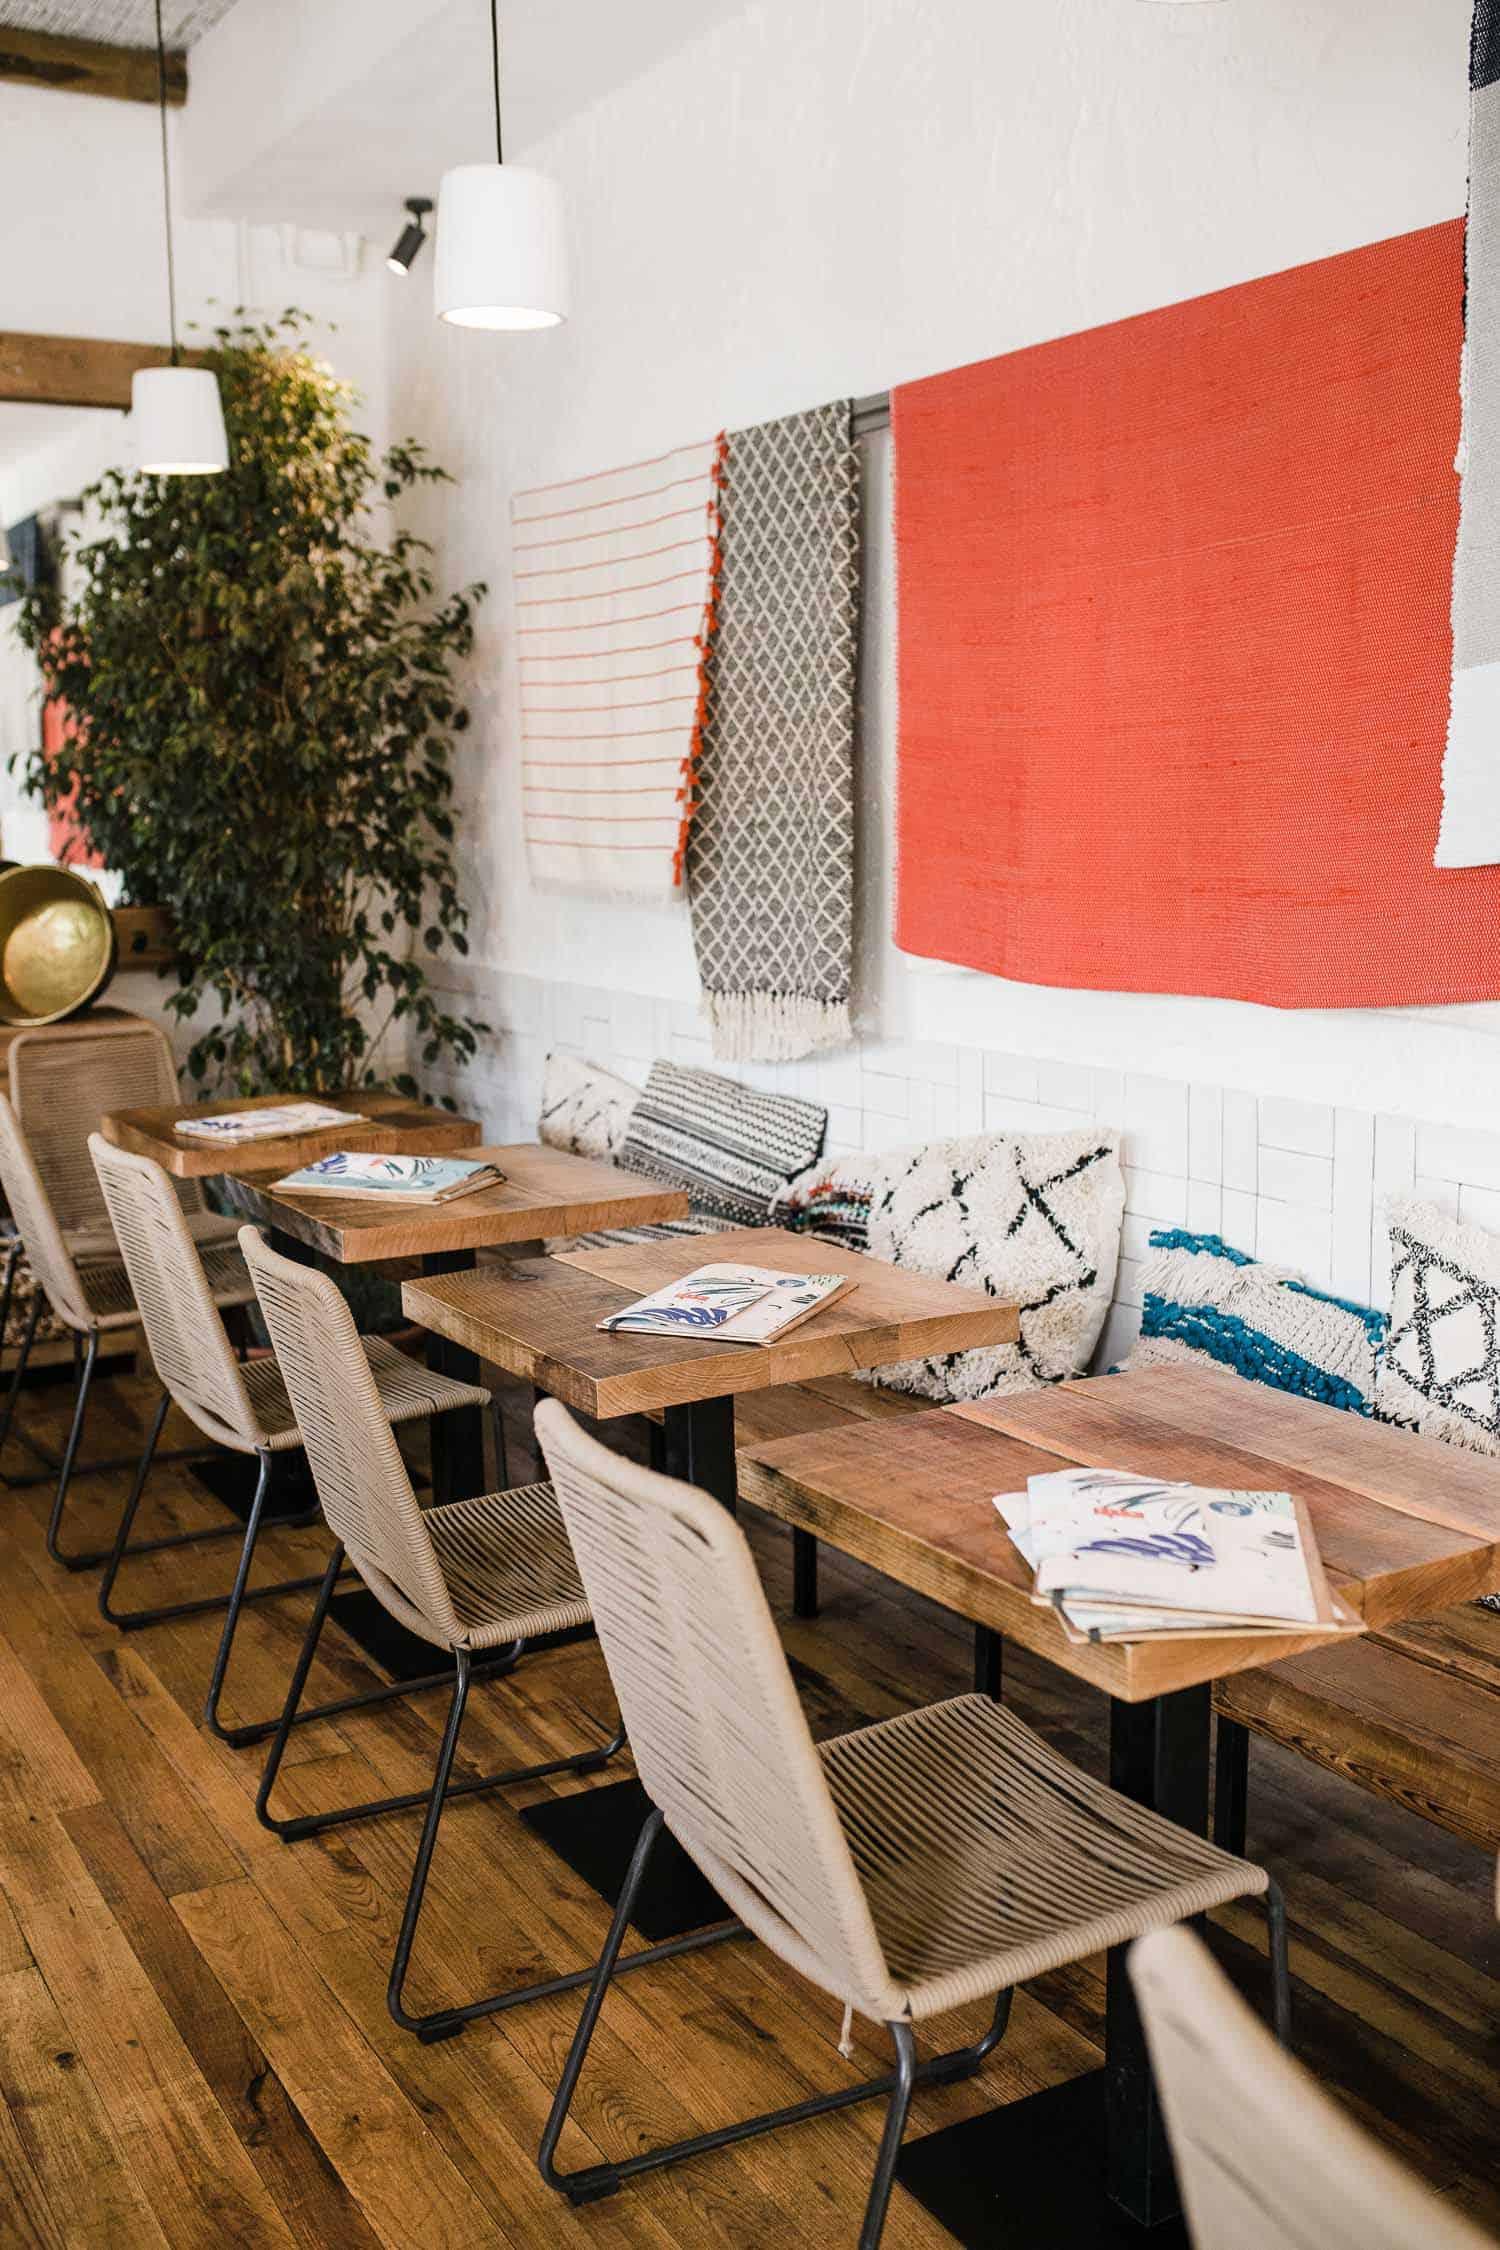 A restaurant in Jessica's travel plan